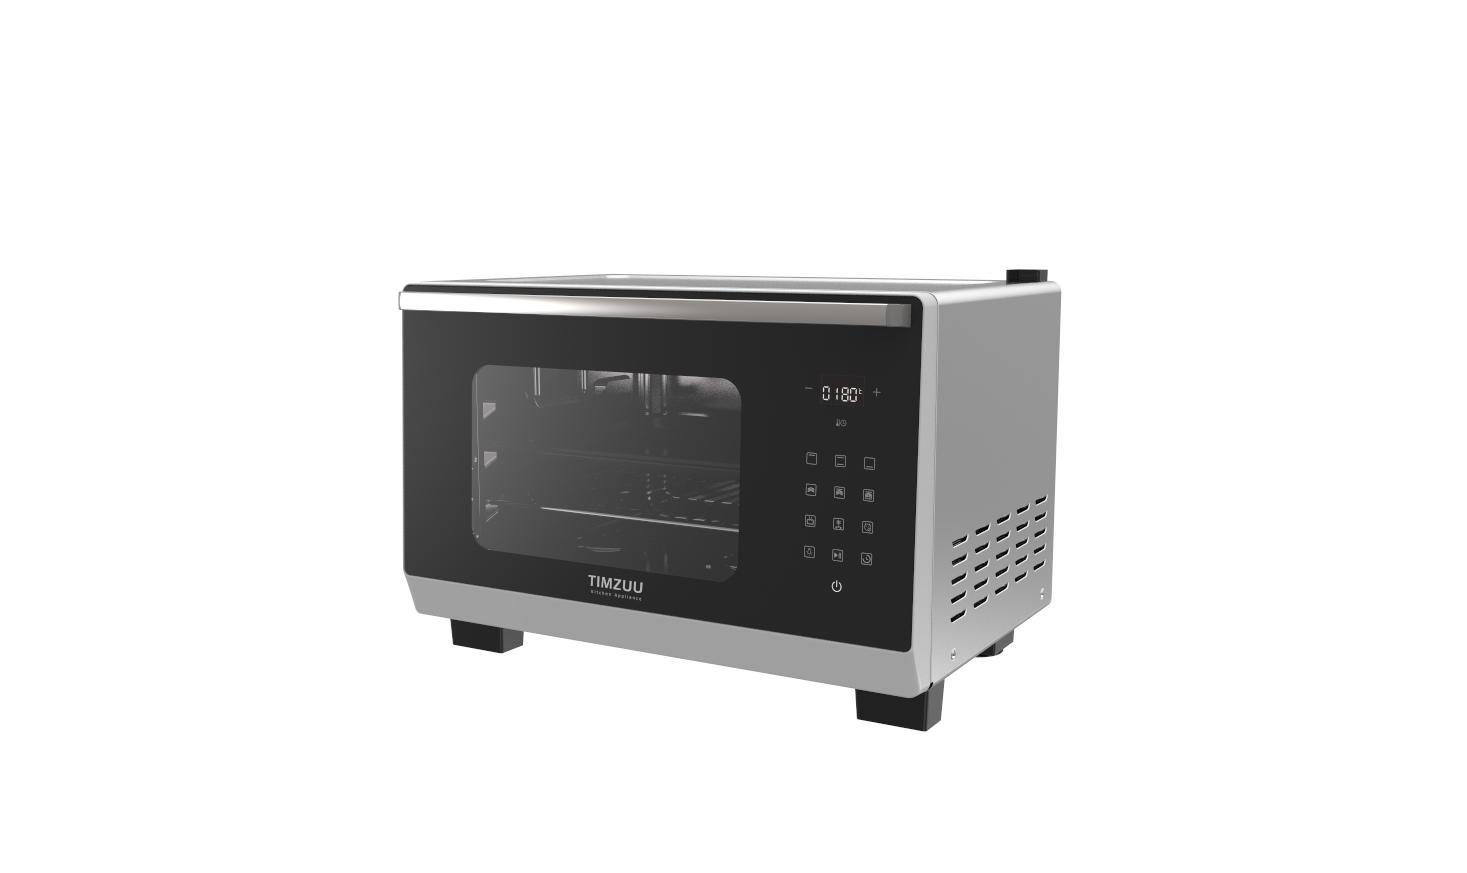 25L knob/ touch screen desktop steam oven 5